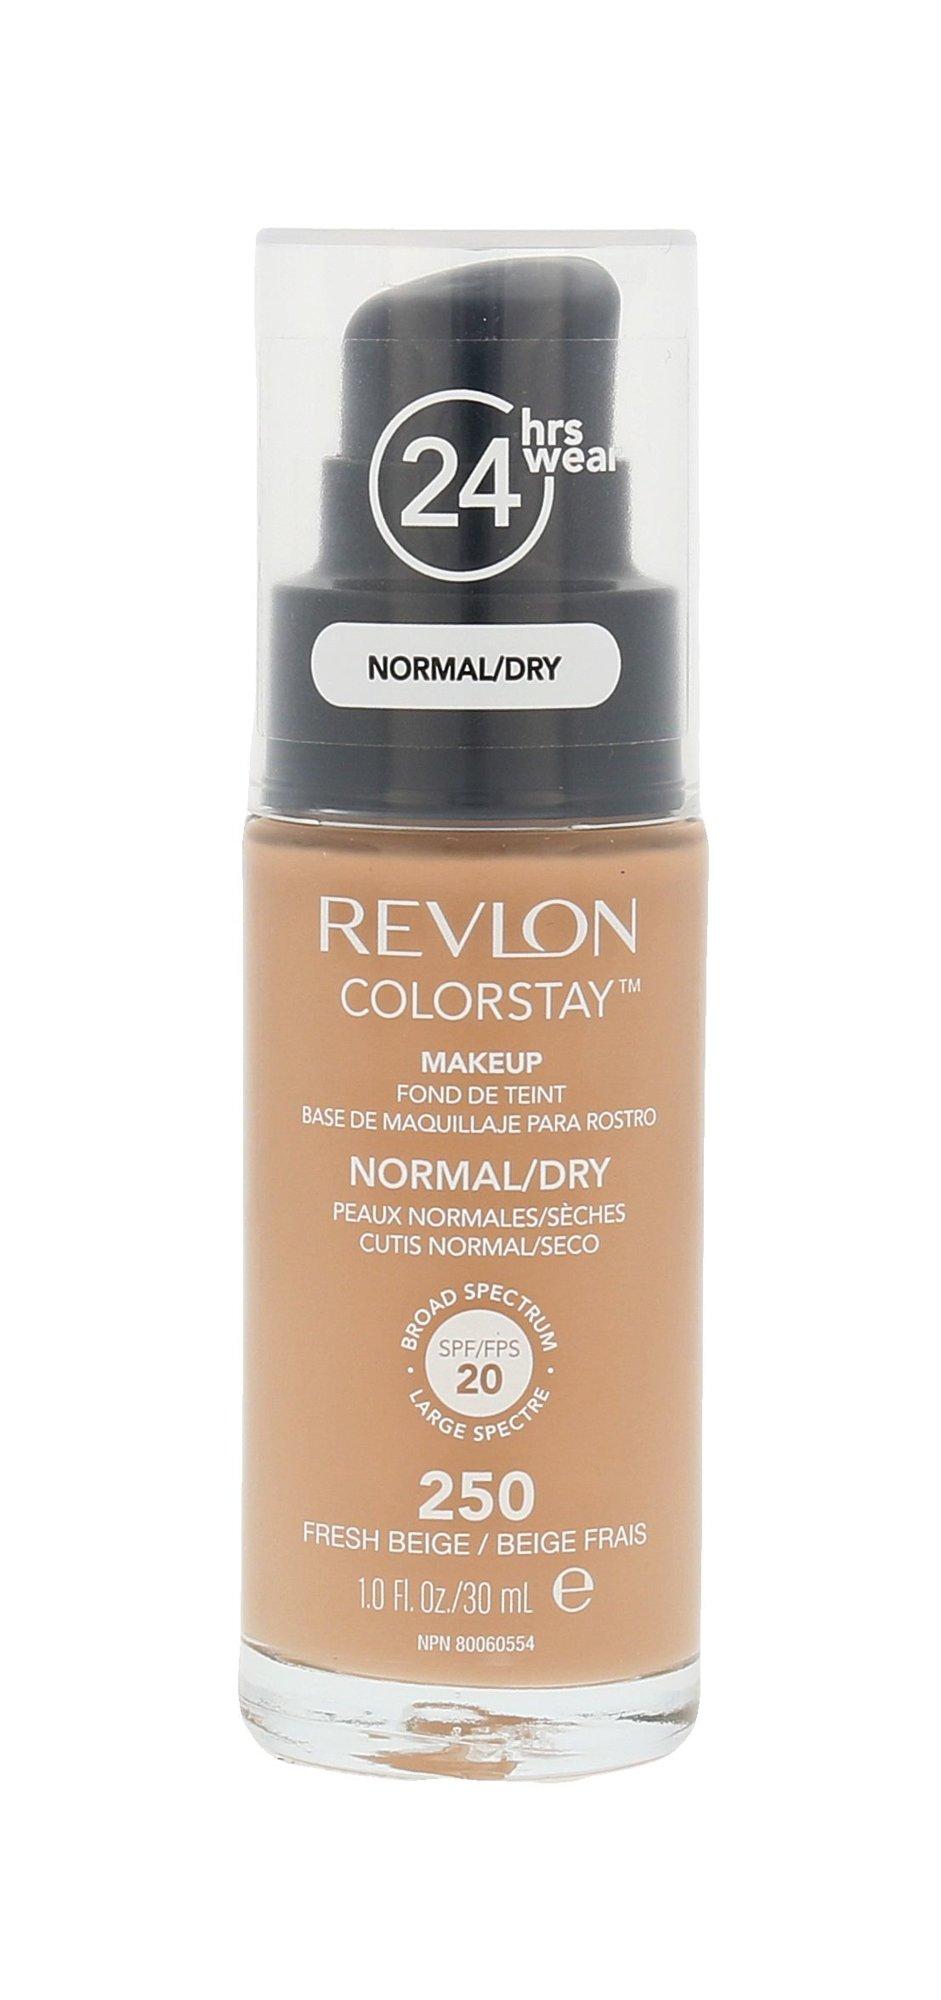 Revlon Colorstay Cosmetic 30ml 250 Fresh Beige